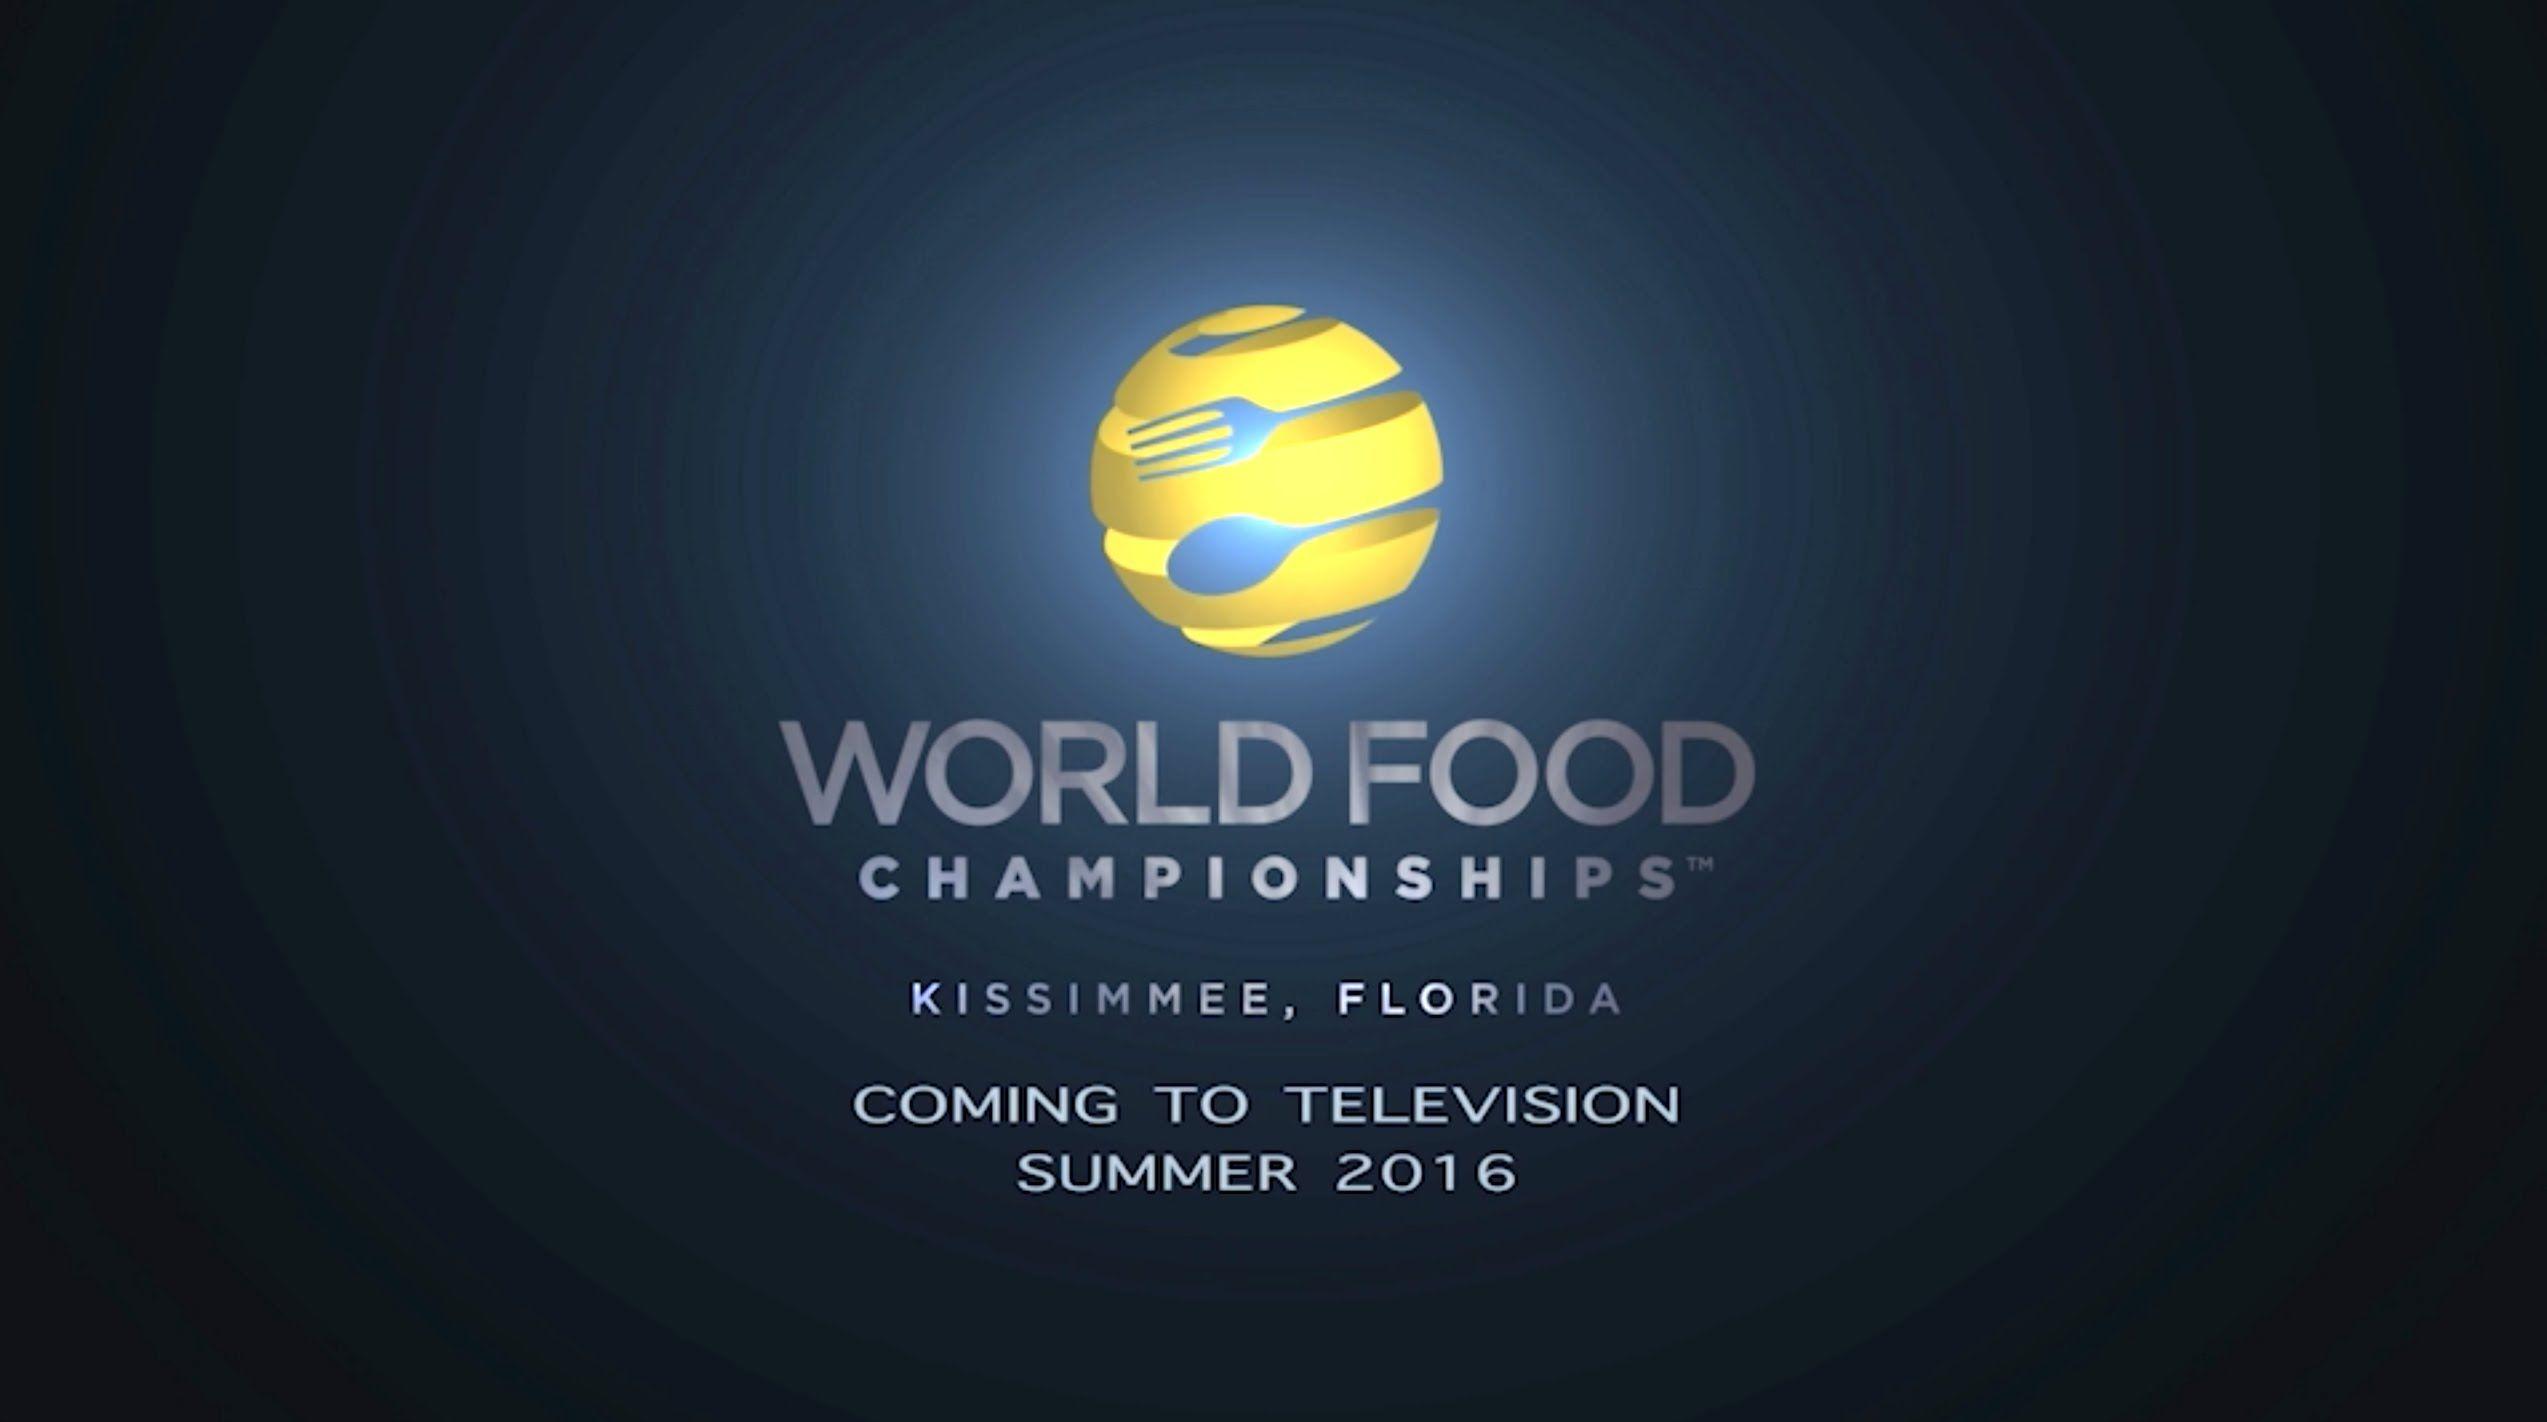 World Food Championships 2015 Sizzle Reel